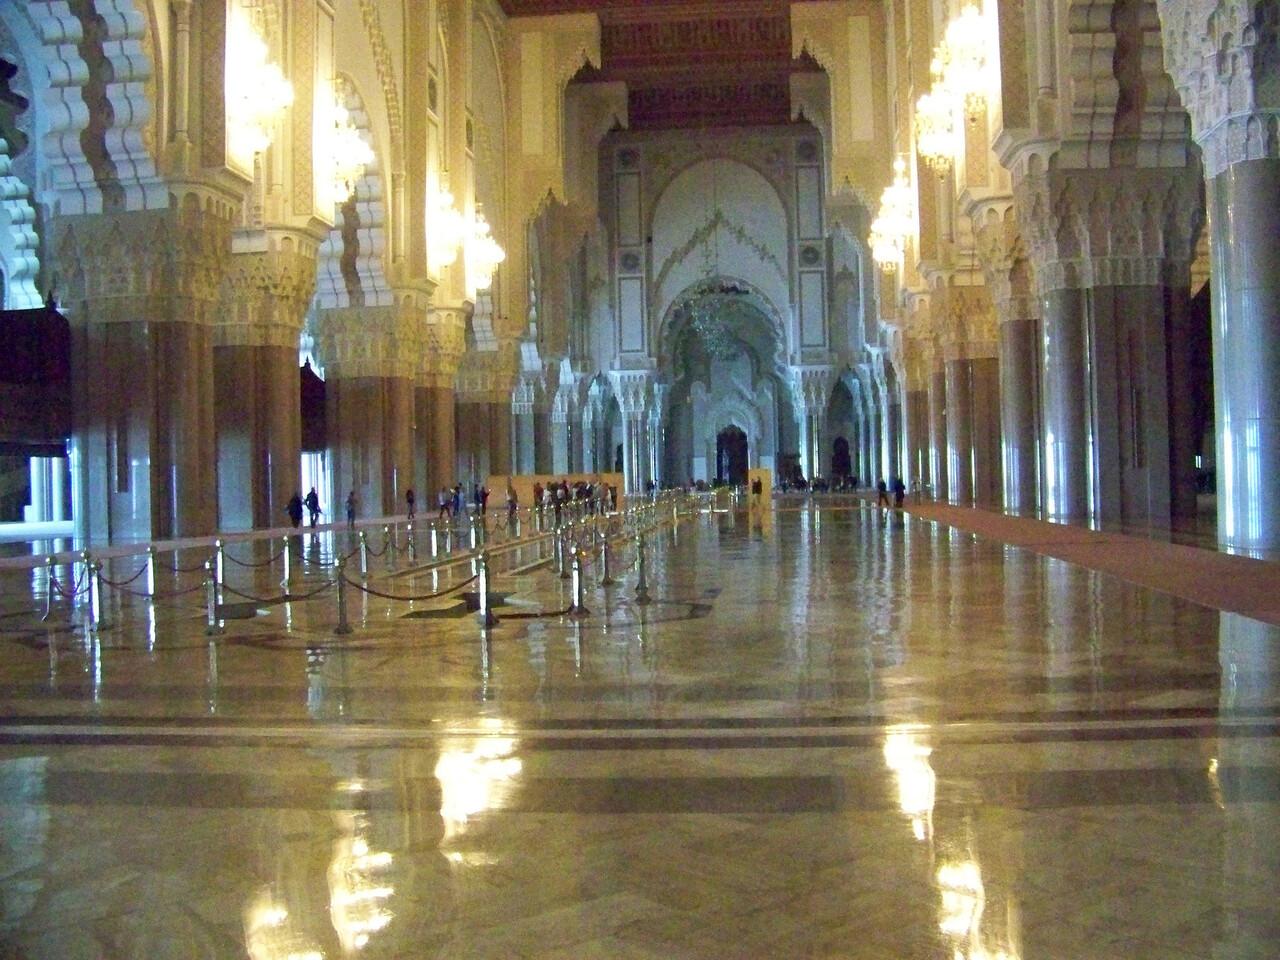 0013 - Hassan II Mosque - Casablanca Morocco.JPG